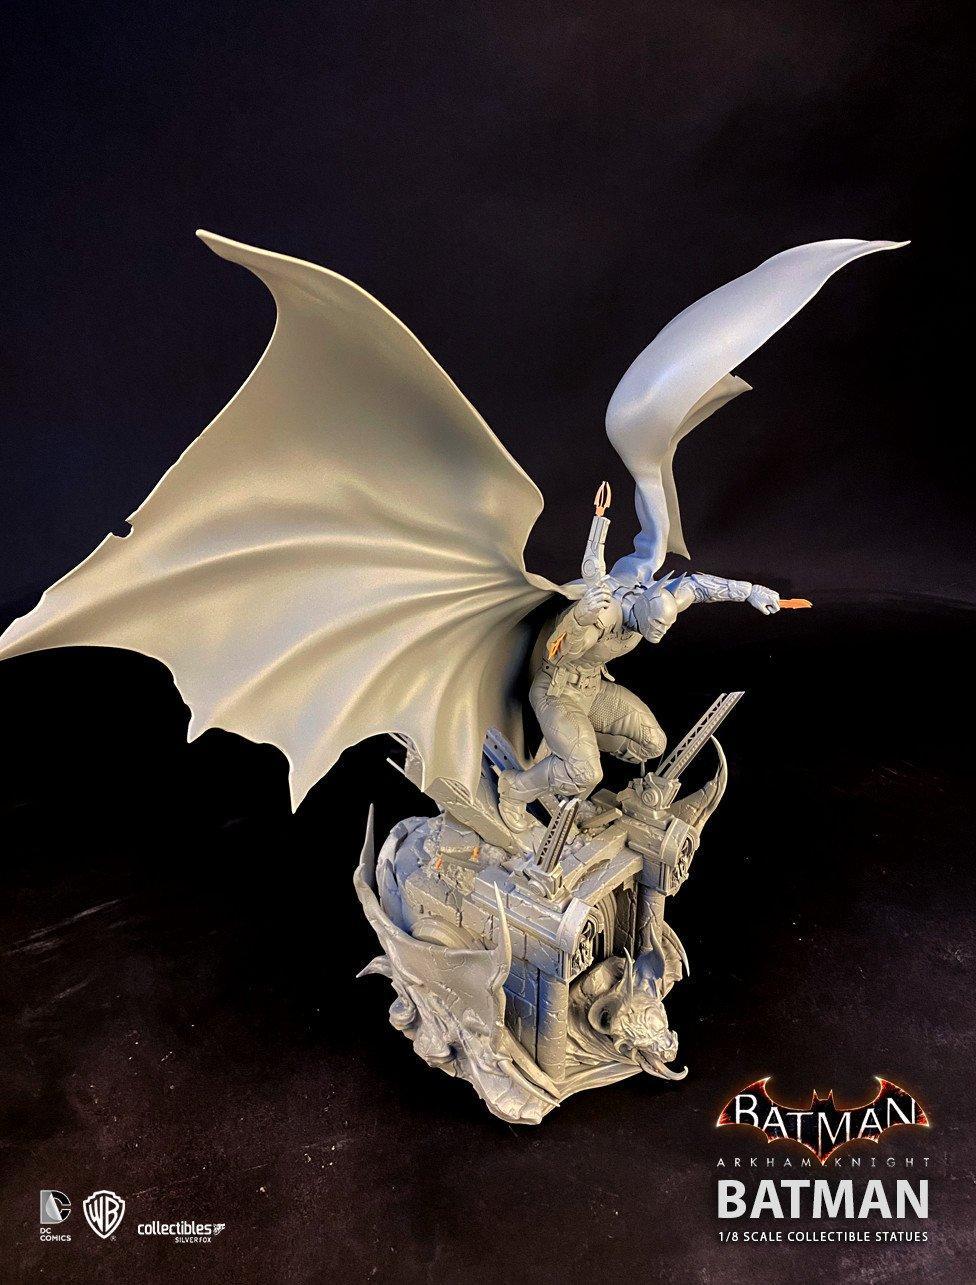 Batman siver fox collectibles batman arkham knight 1 8 scale statue3